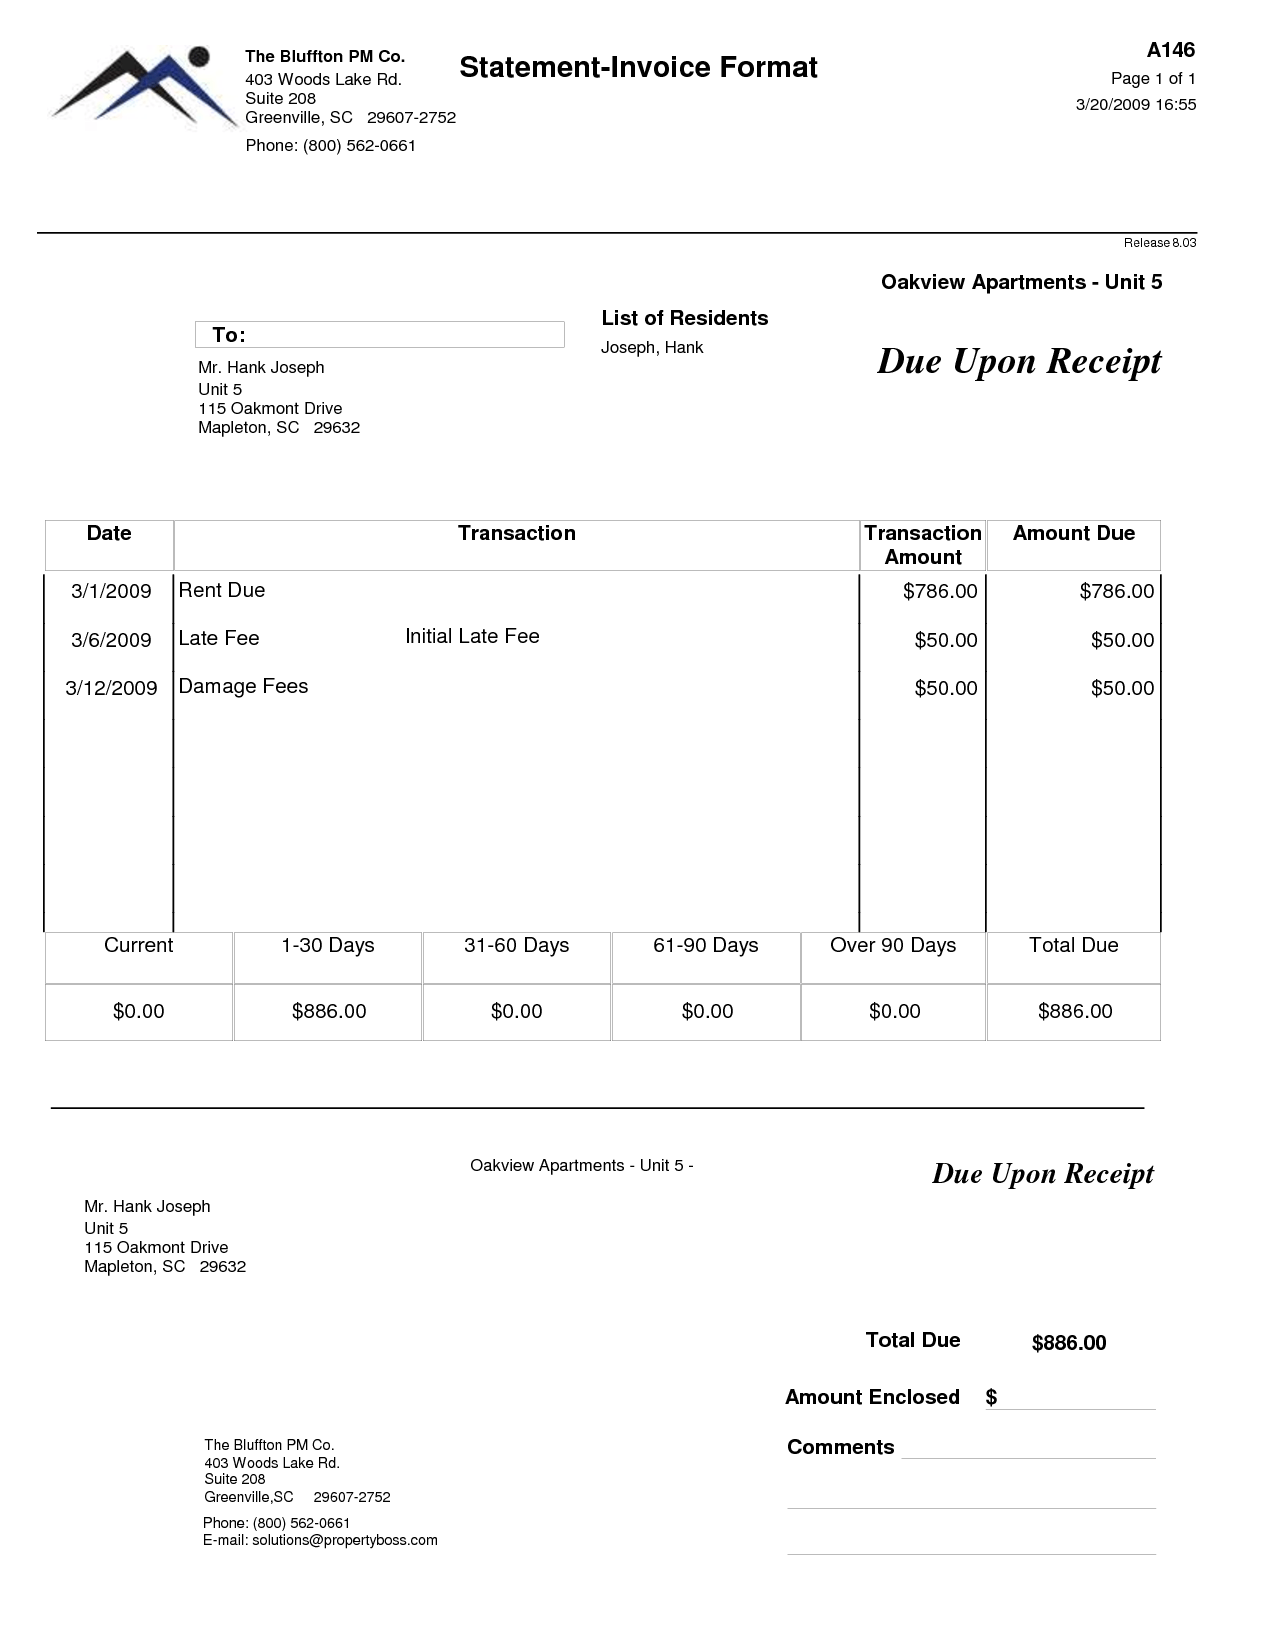 Car Insurance Due Date